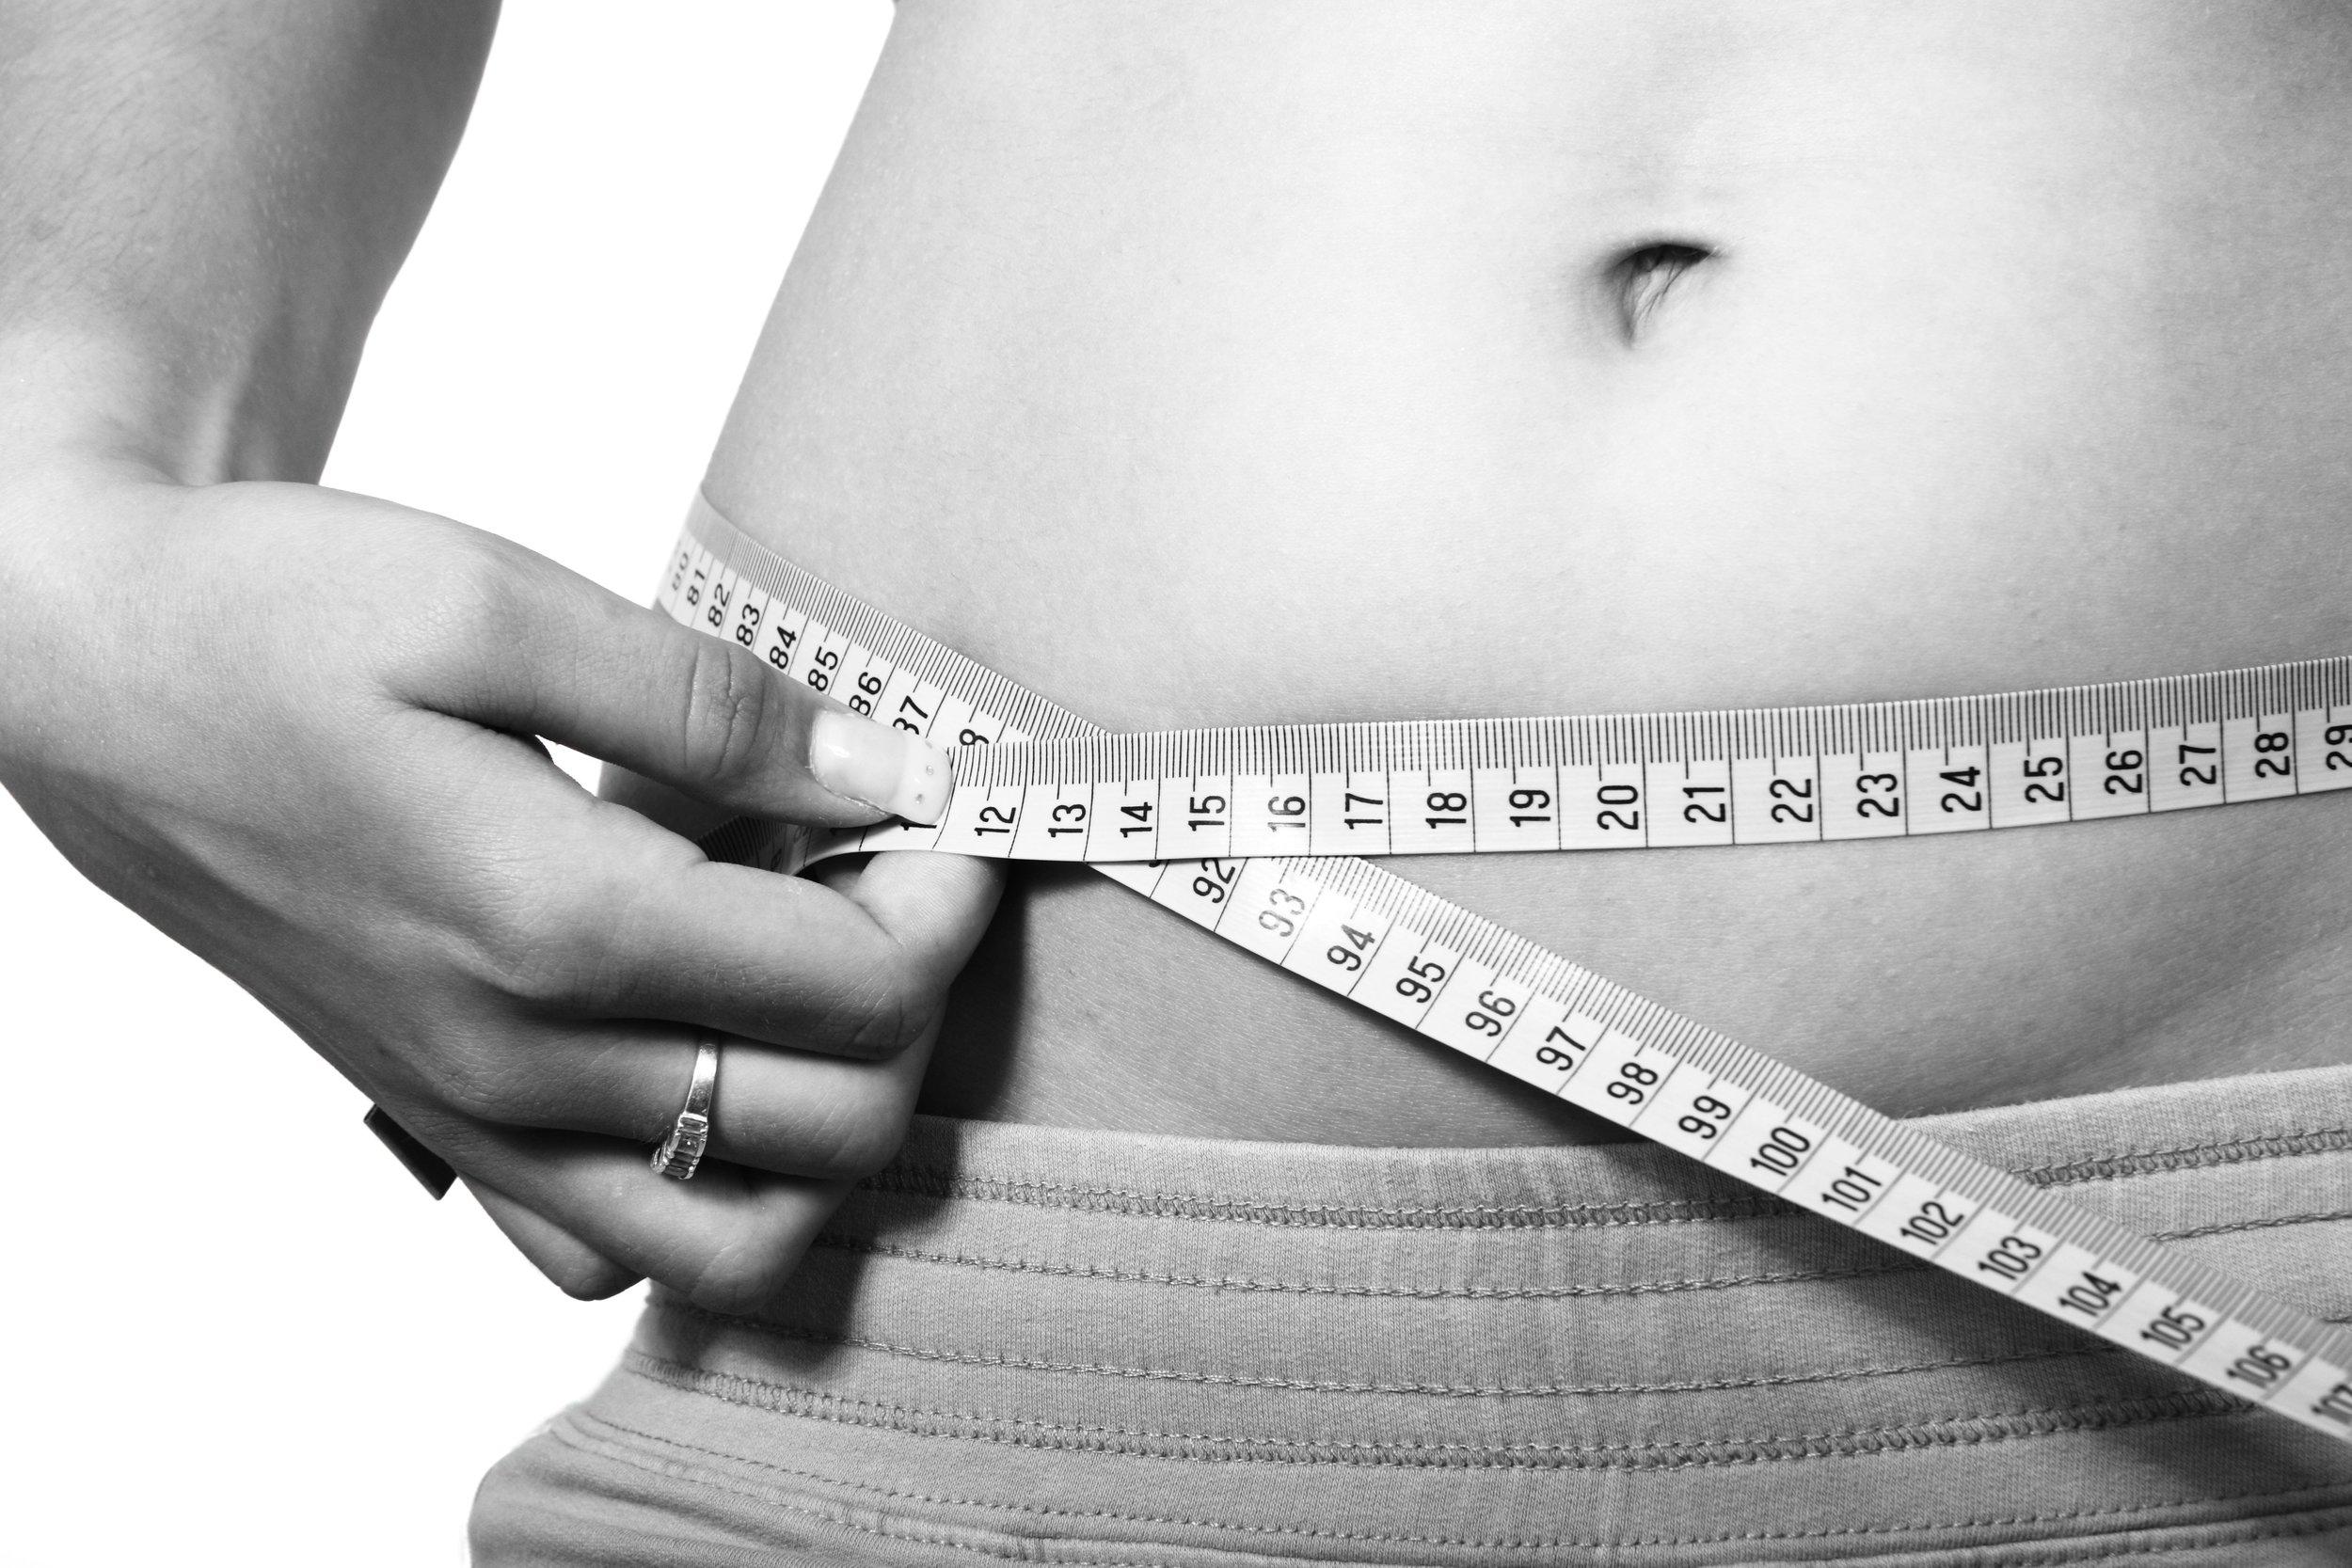 belly-black-and-white-body-42069.jpg